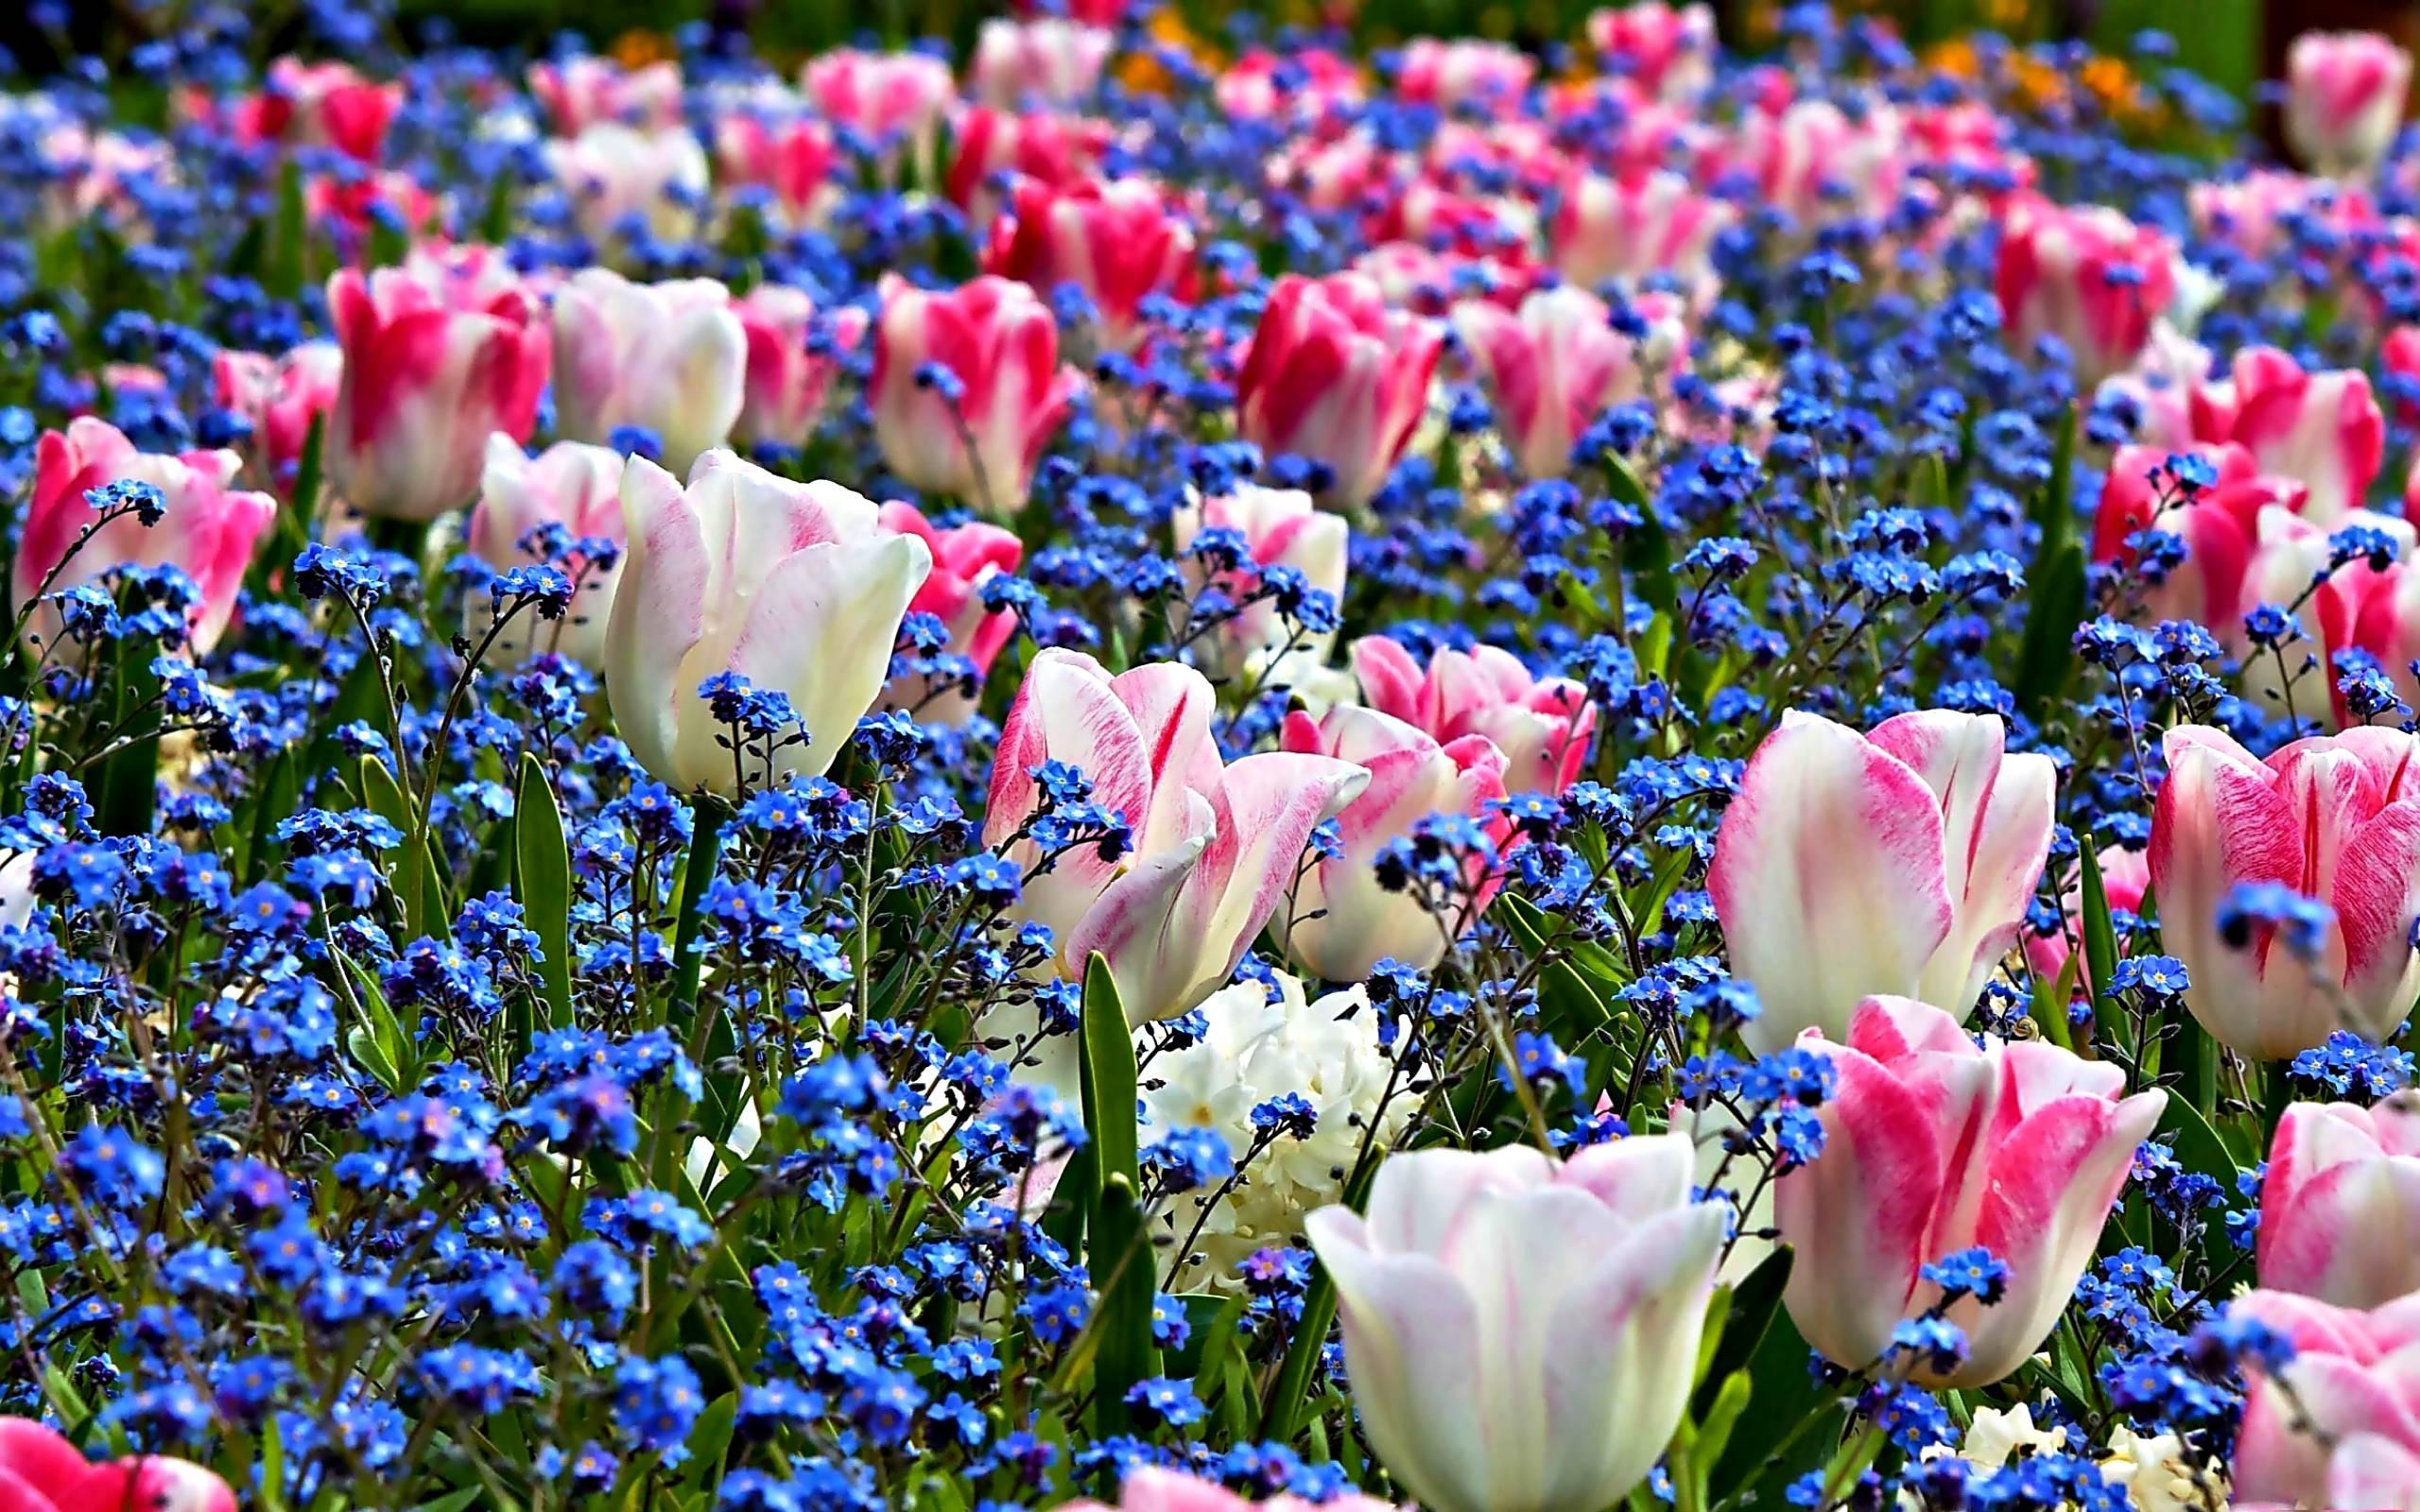 Spring Flower Wallpaper Backgrounds 2560x1600